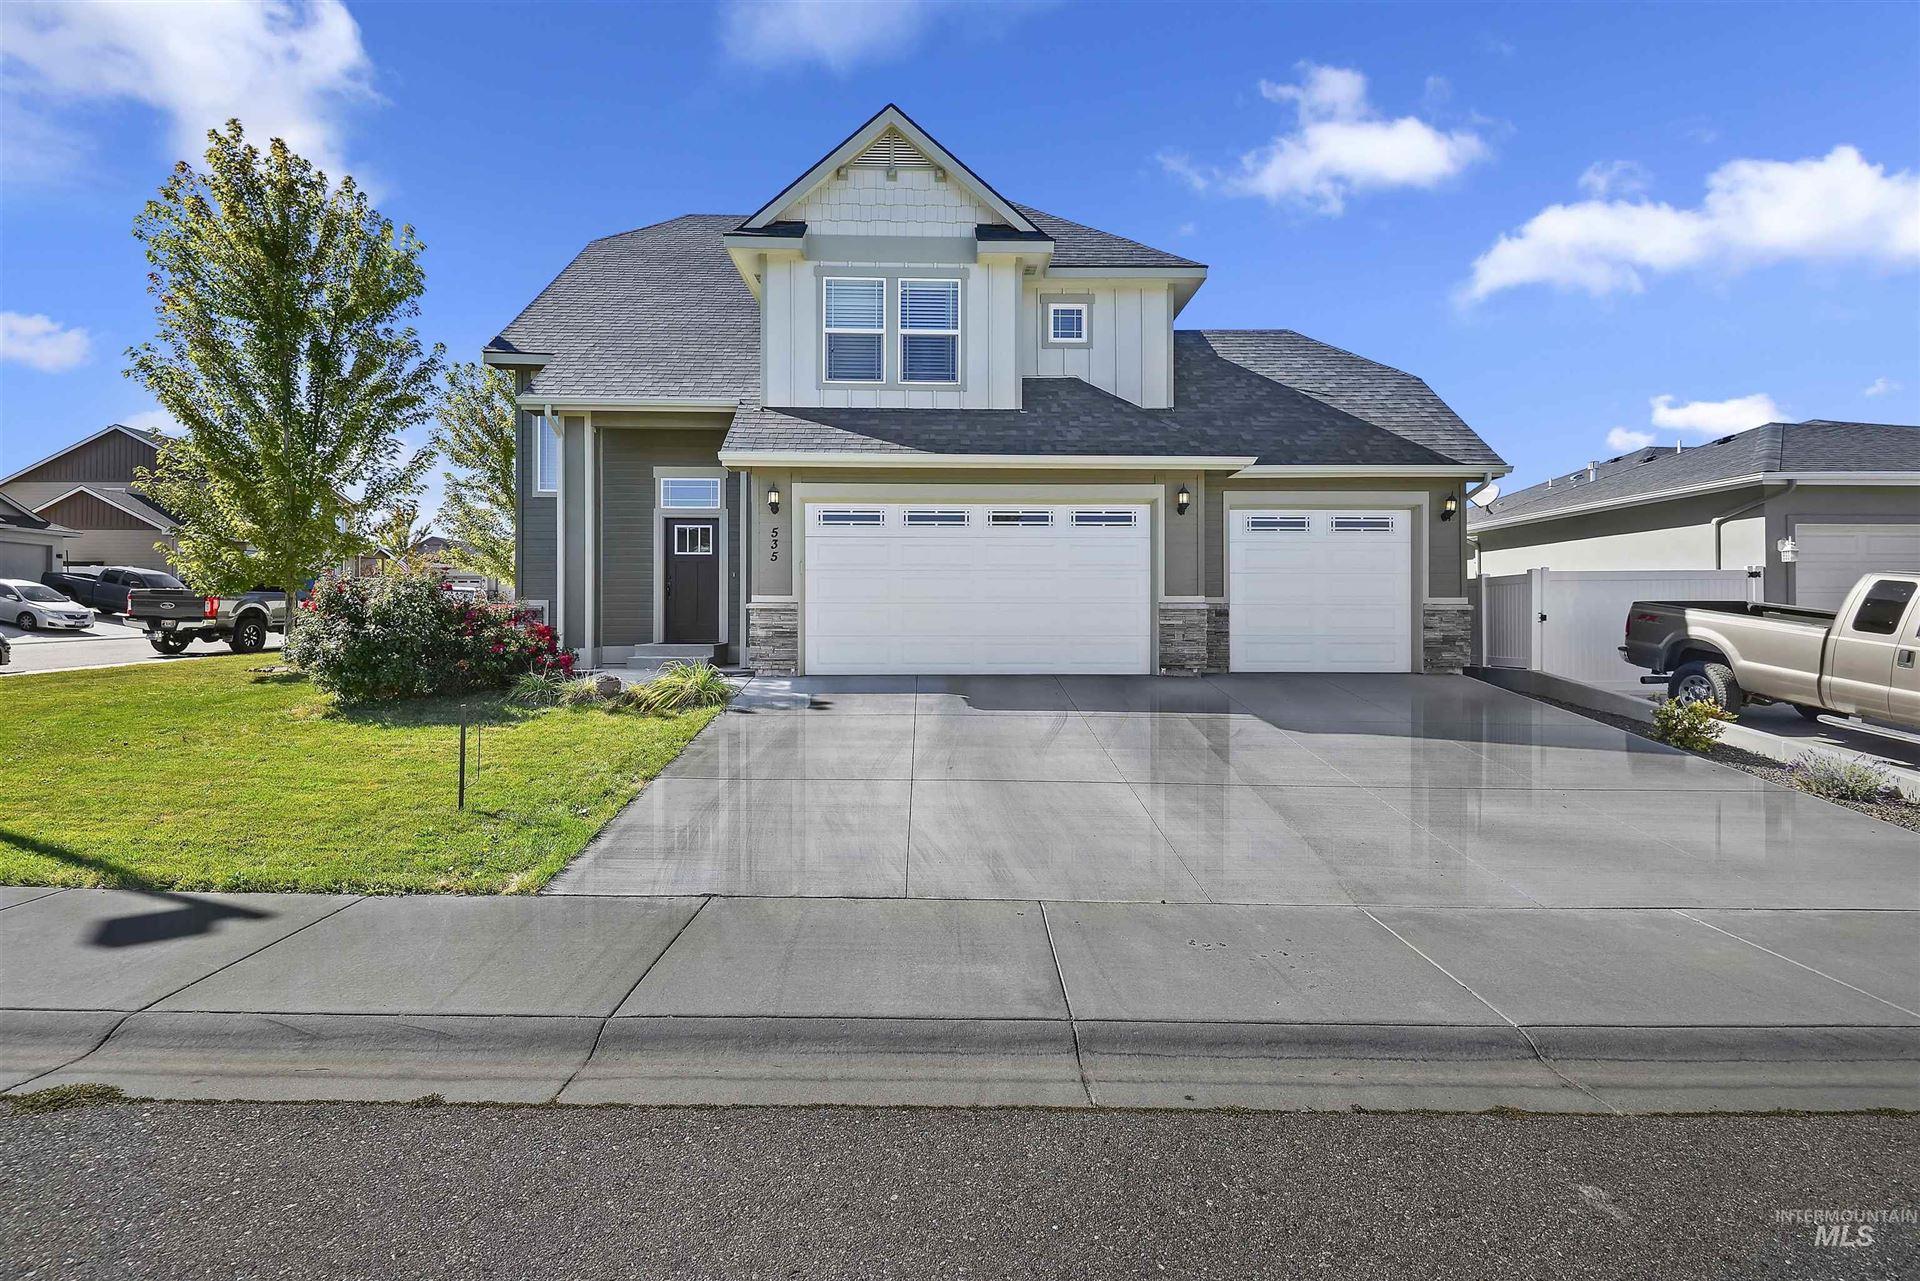 535 S Tailings Ave, Kuna, ID 83634 - MLS#: 98820005